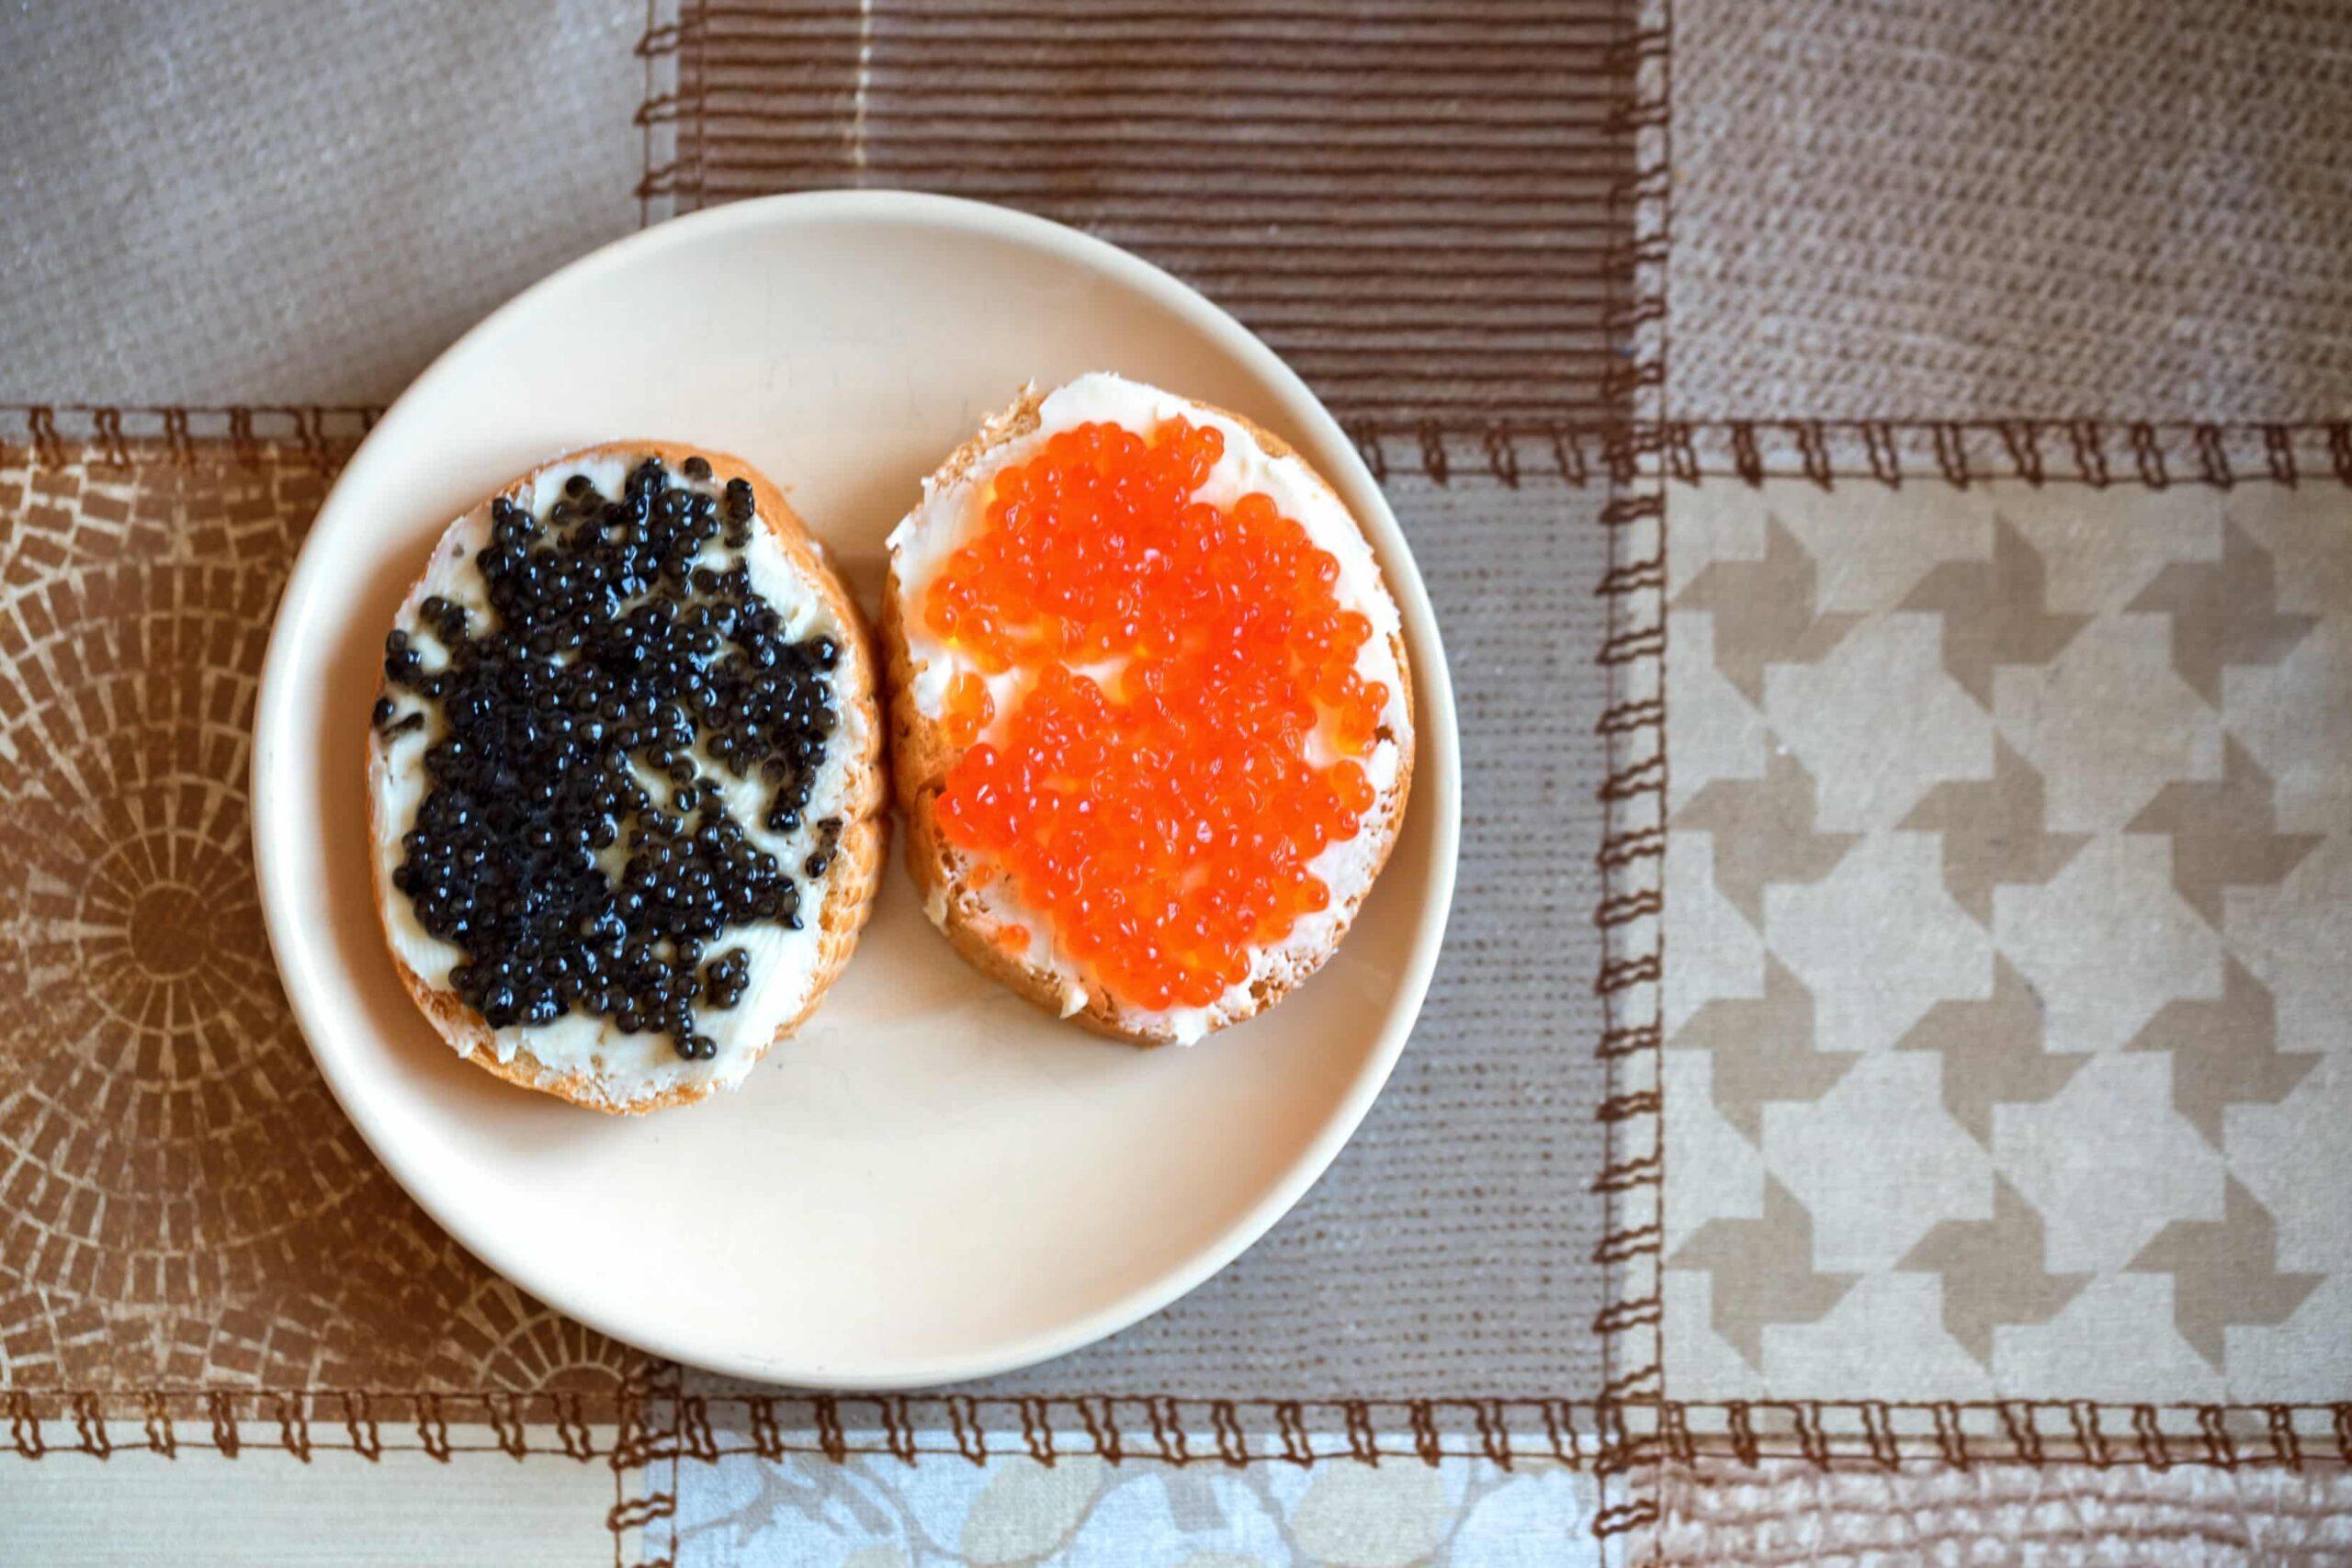 sandwiches-with-red-and-black-caviar-2021-04-02-23-23-47-utc-min-7643851